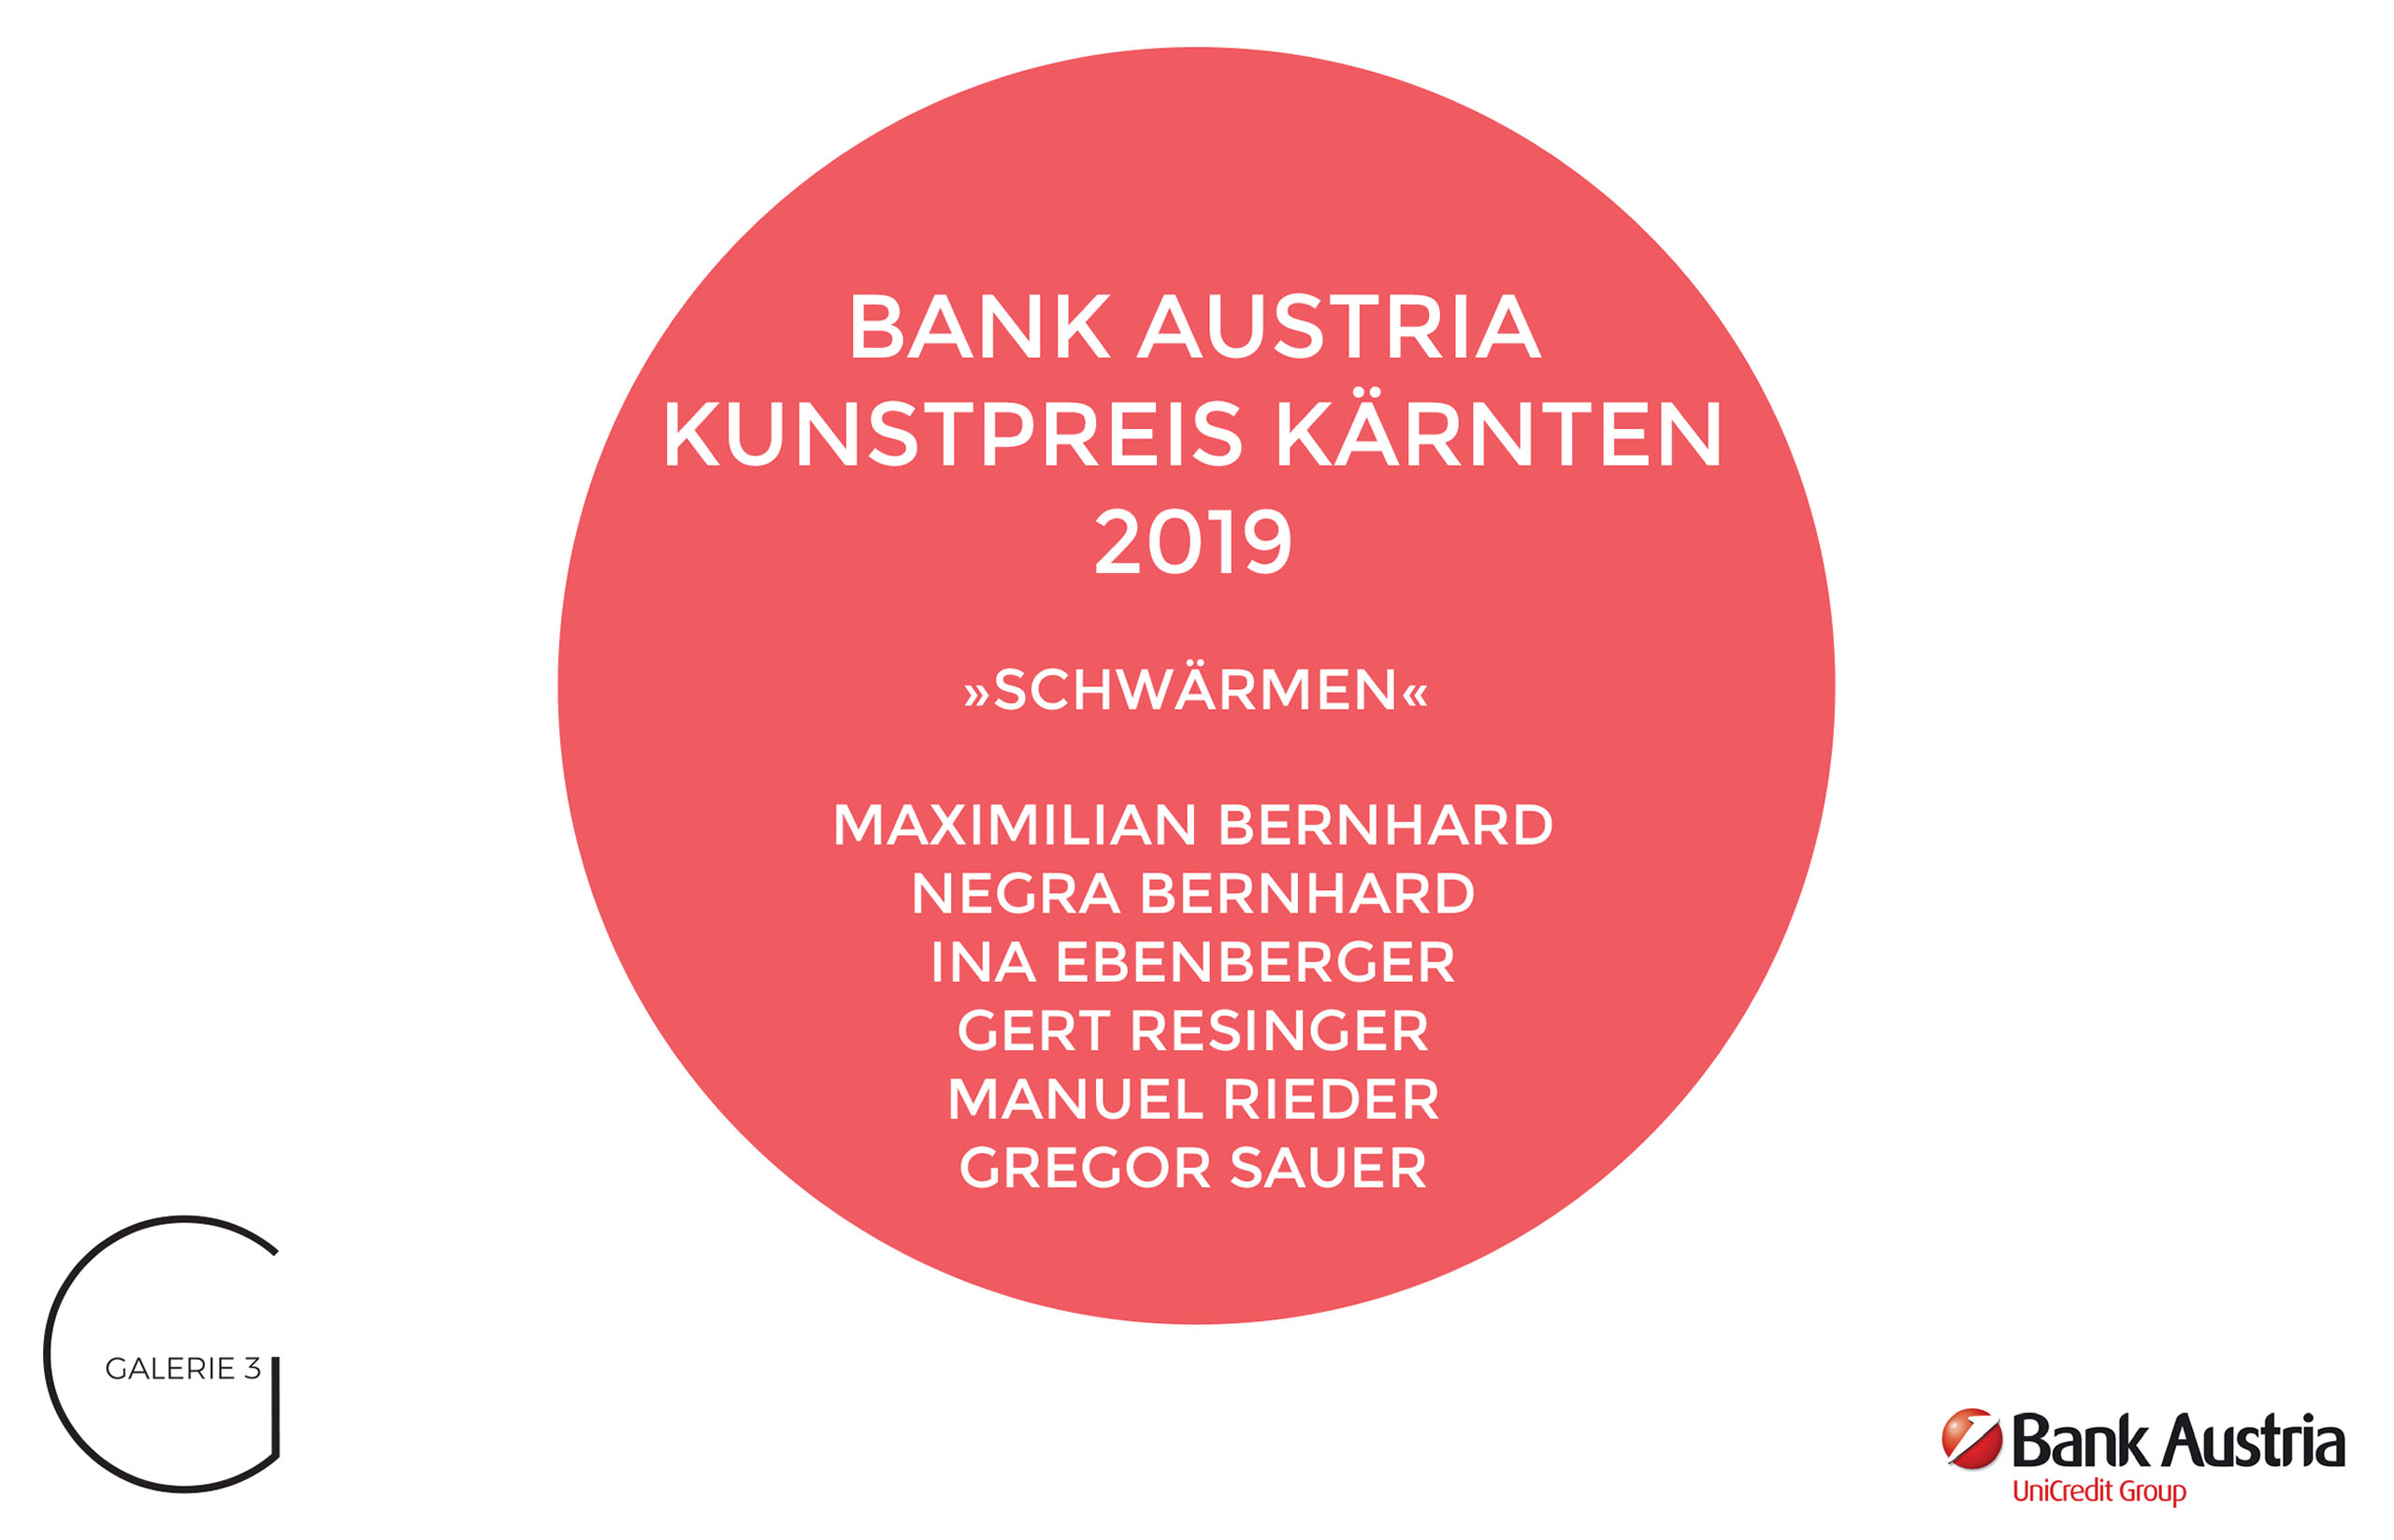 Bank Austria Kunstpreis 2019 | Galerie3